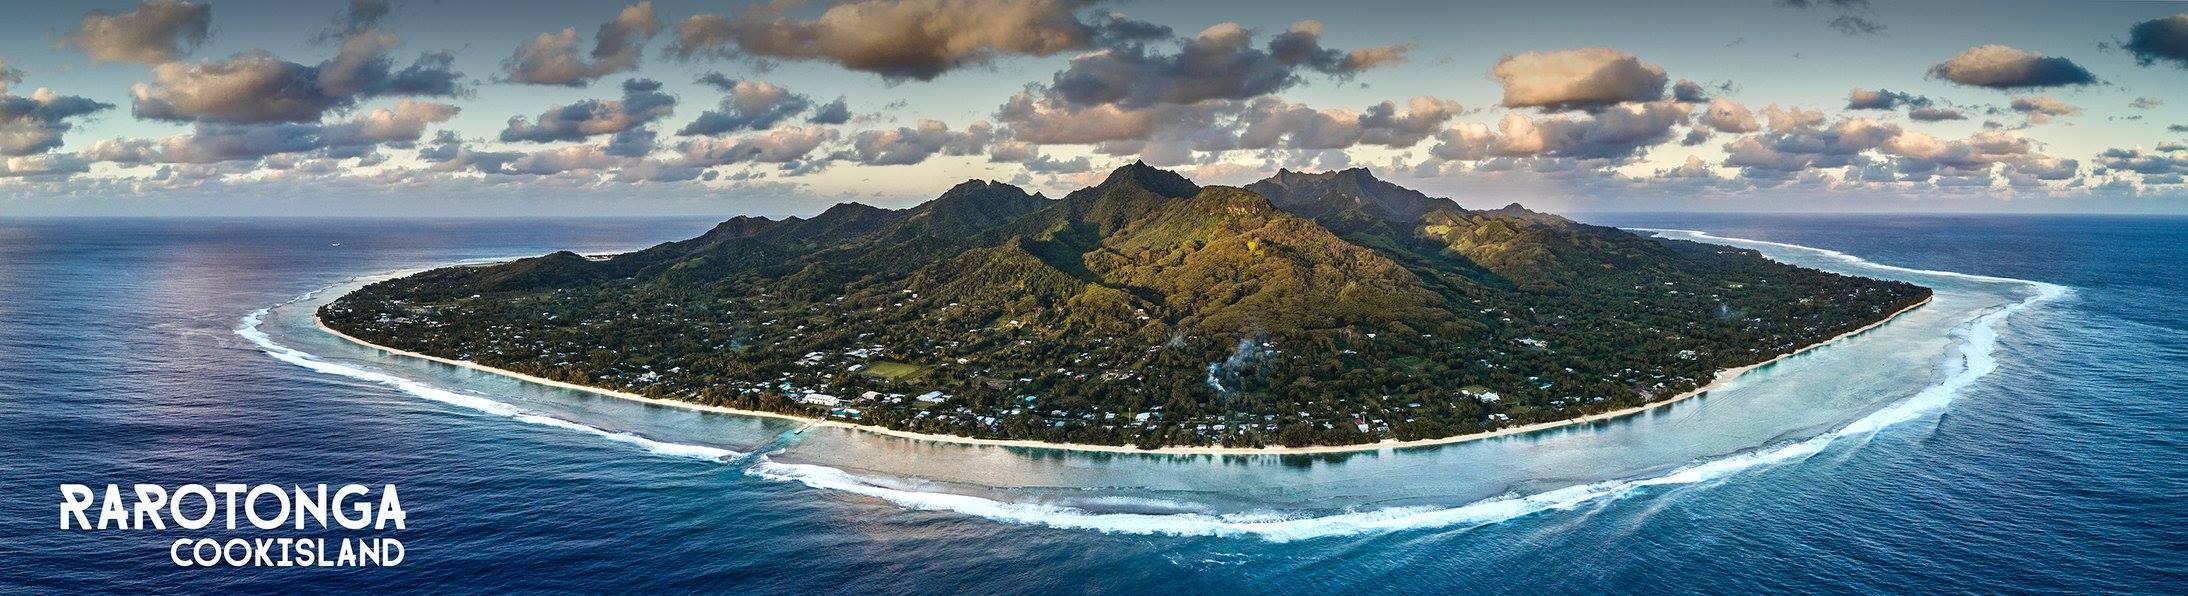 Drone_Rarotonga